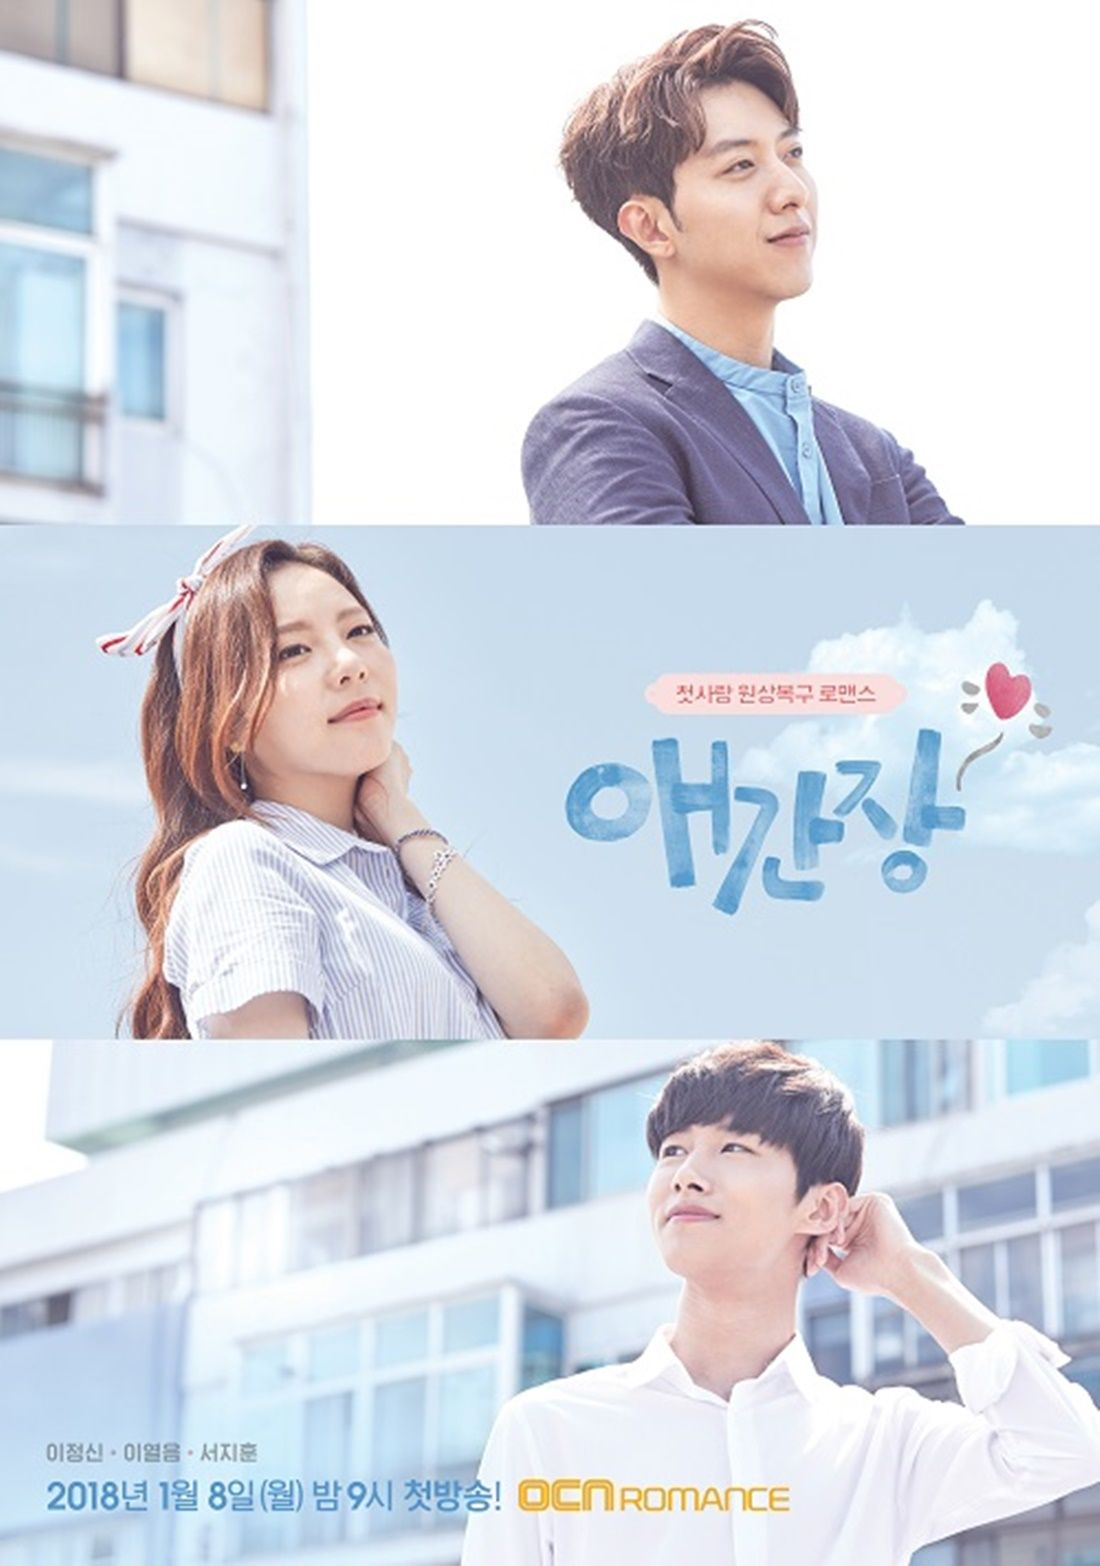 Longing Heart - 2018 Korean Mini Drama | 10 eps long, short